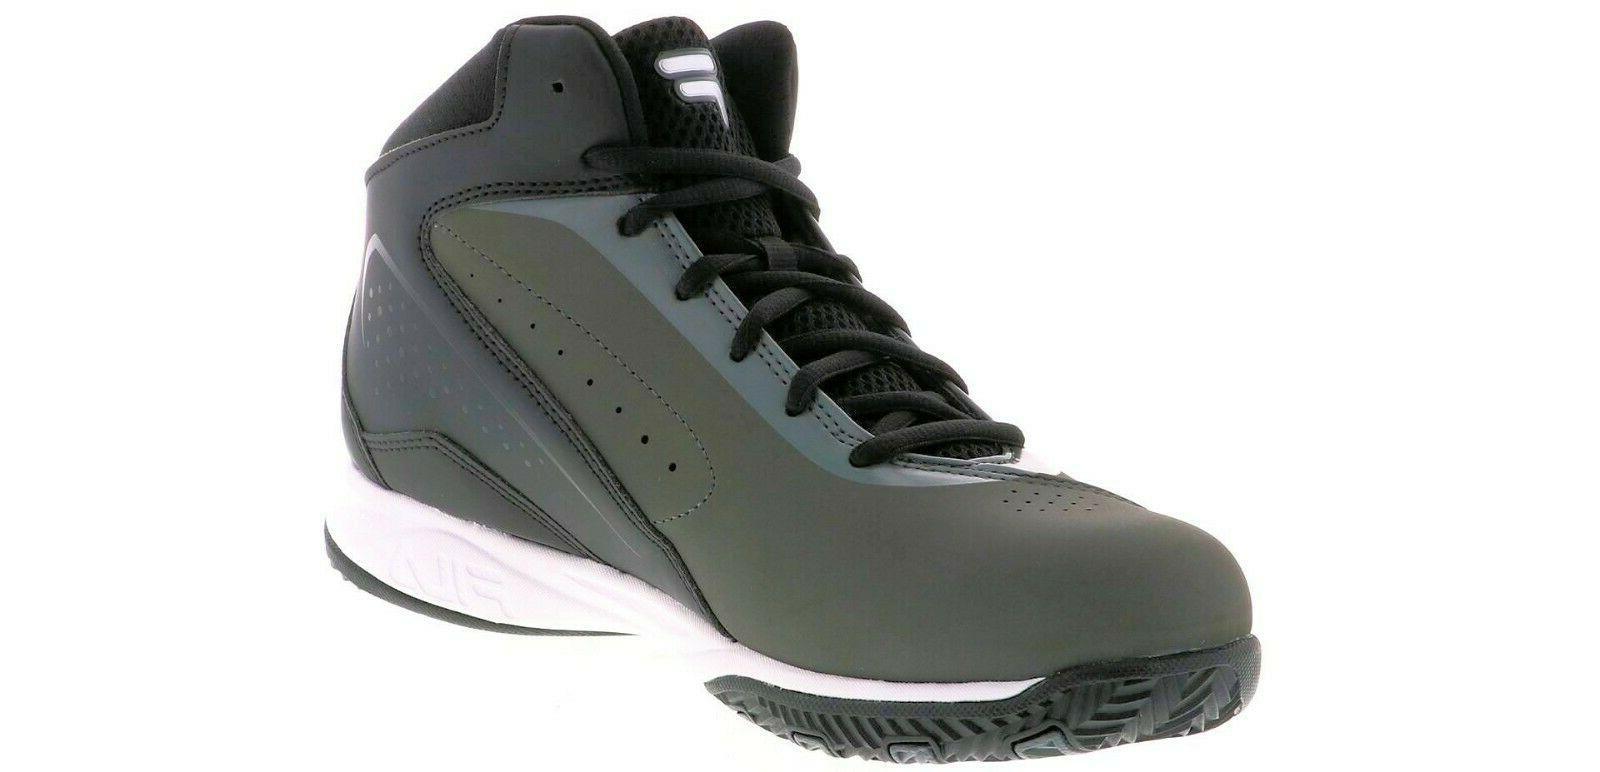 Men's Fila® Contingent Basketball Shoes Size 13